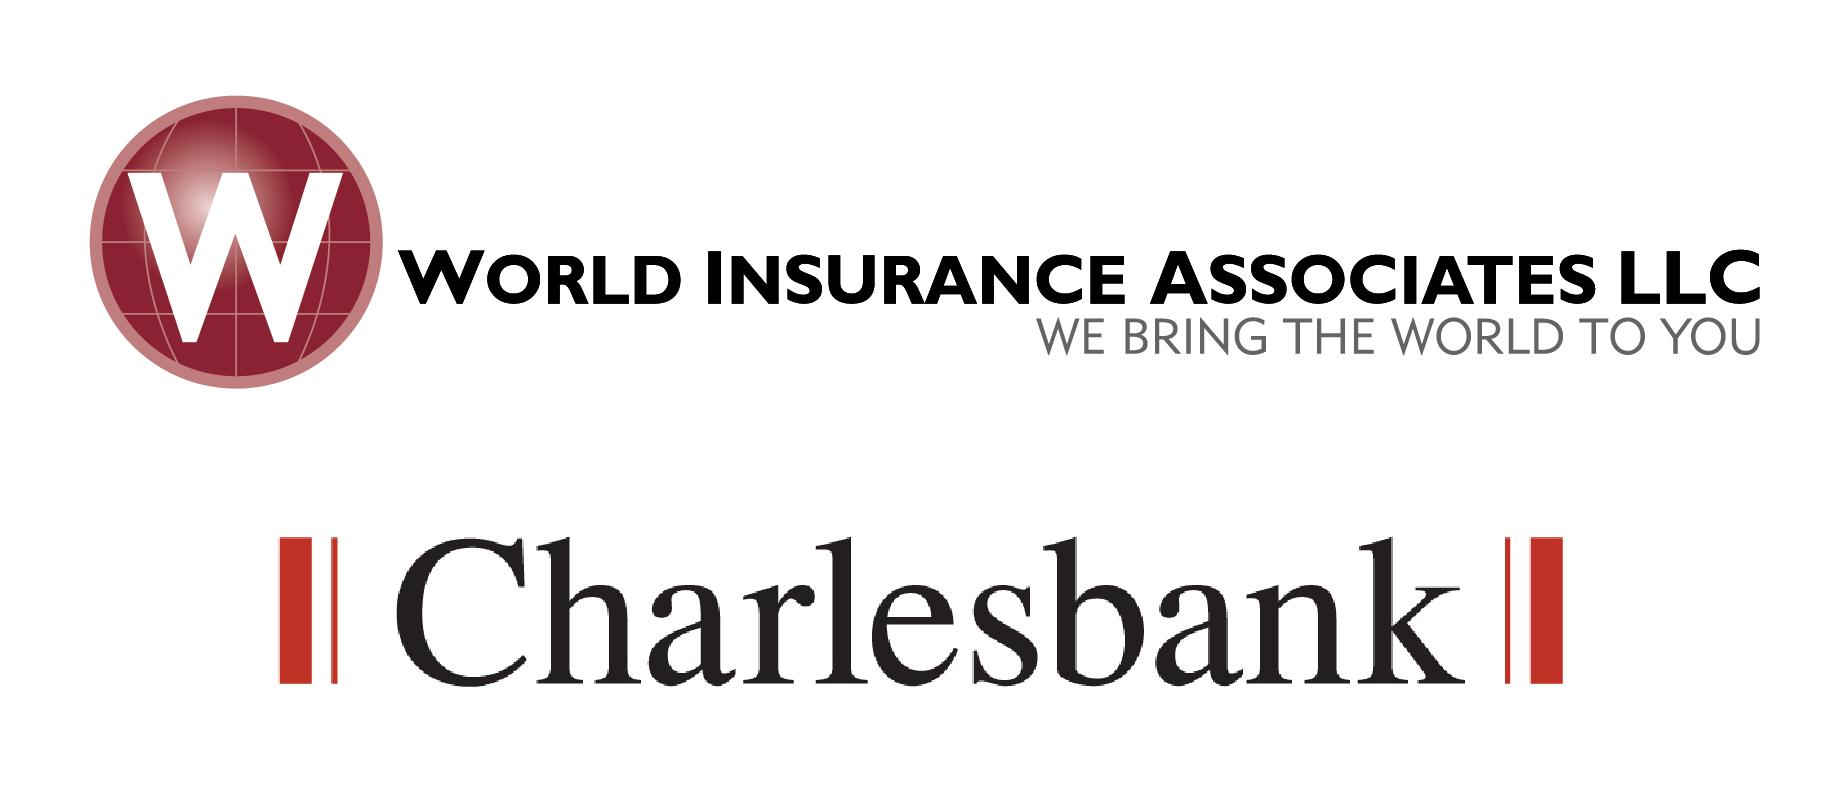 World Insurance Associates, We Bring The World To You, Charlesbank